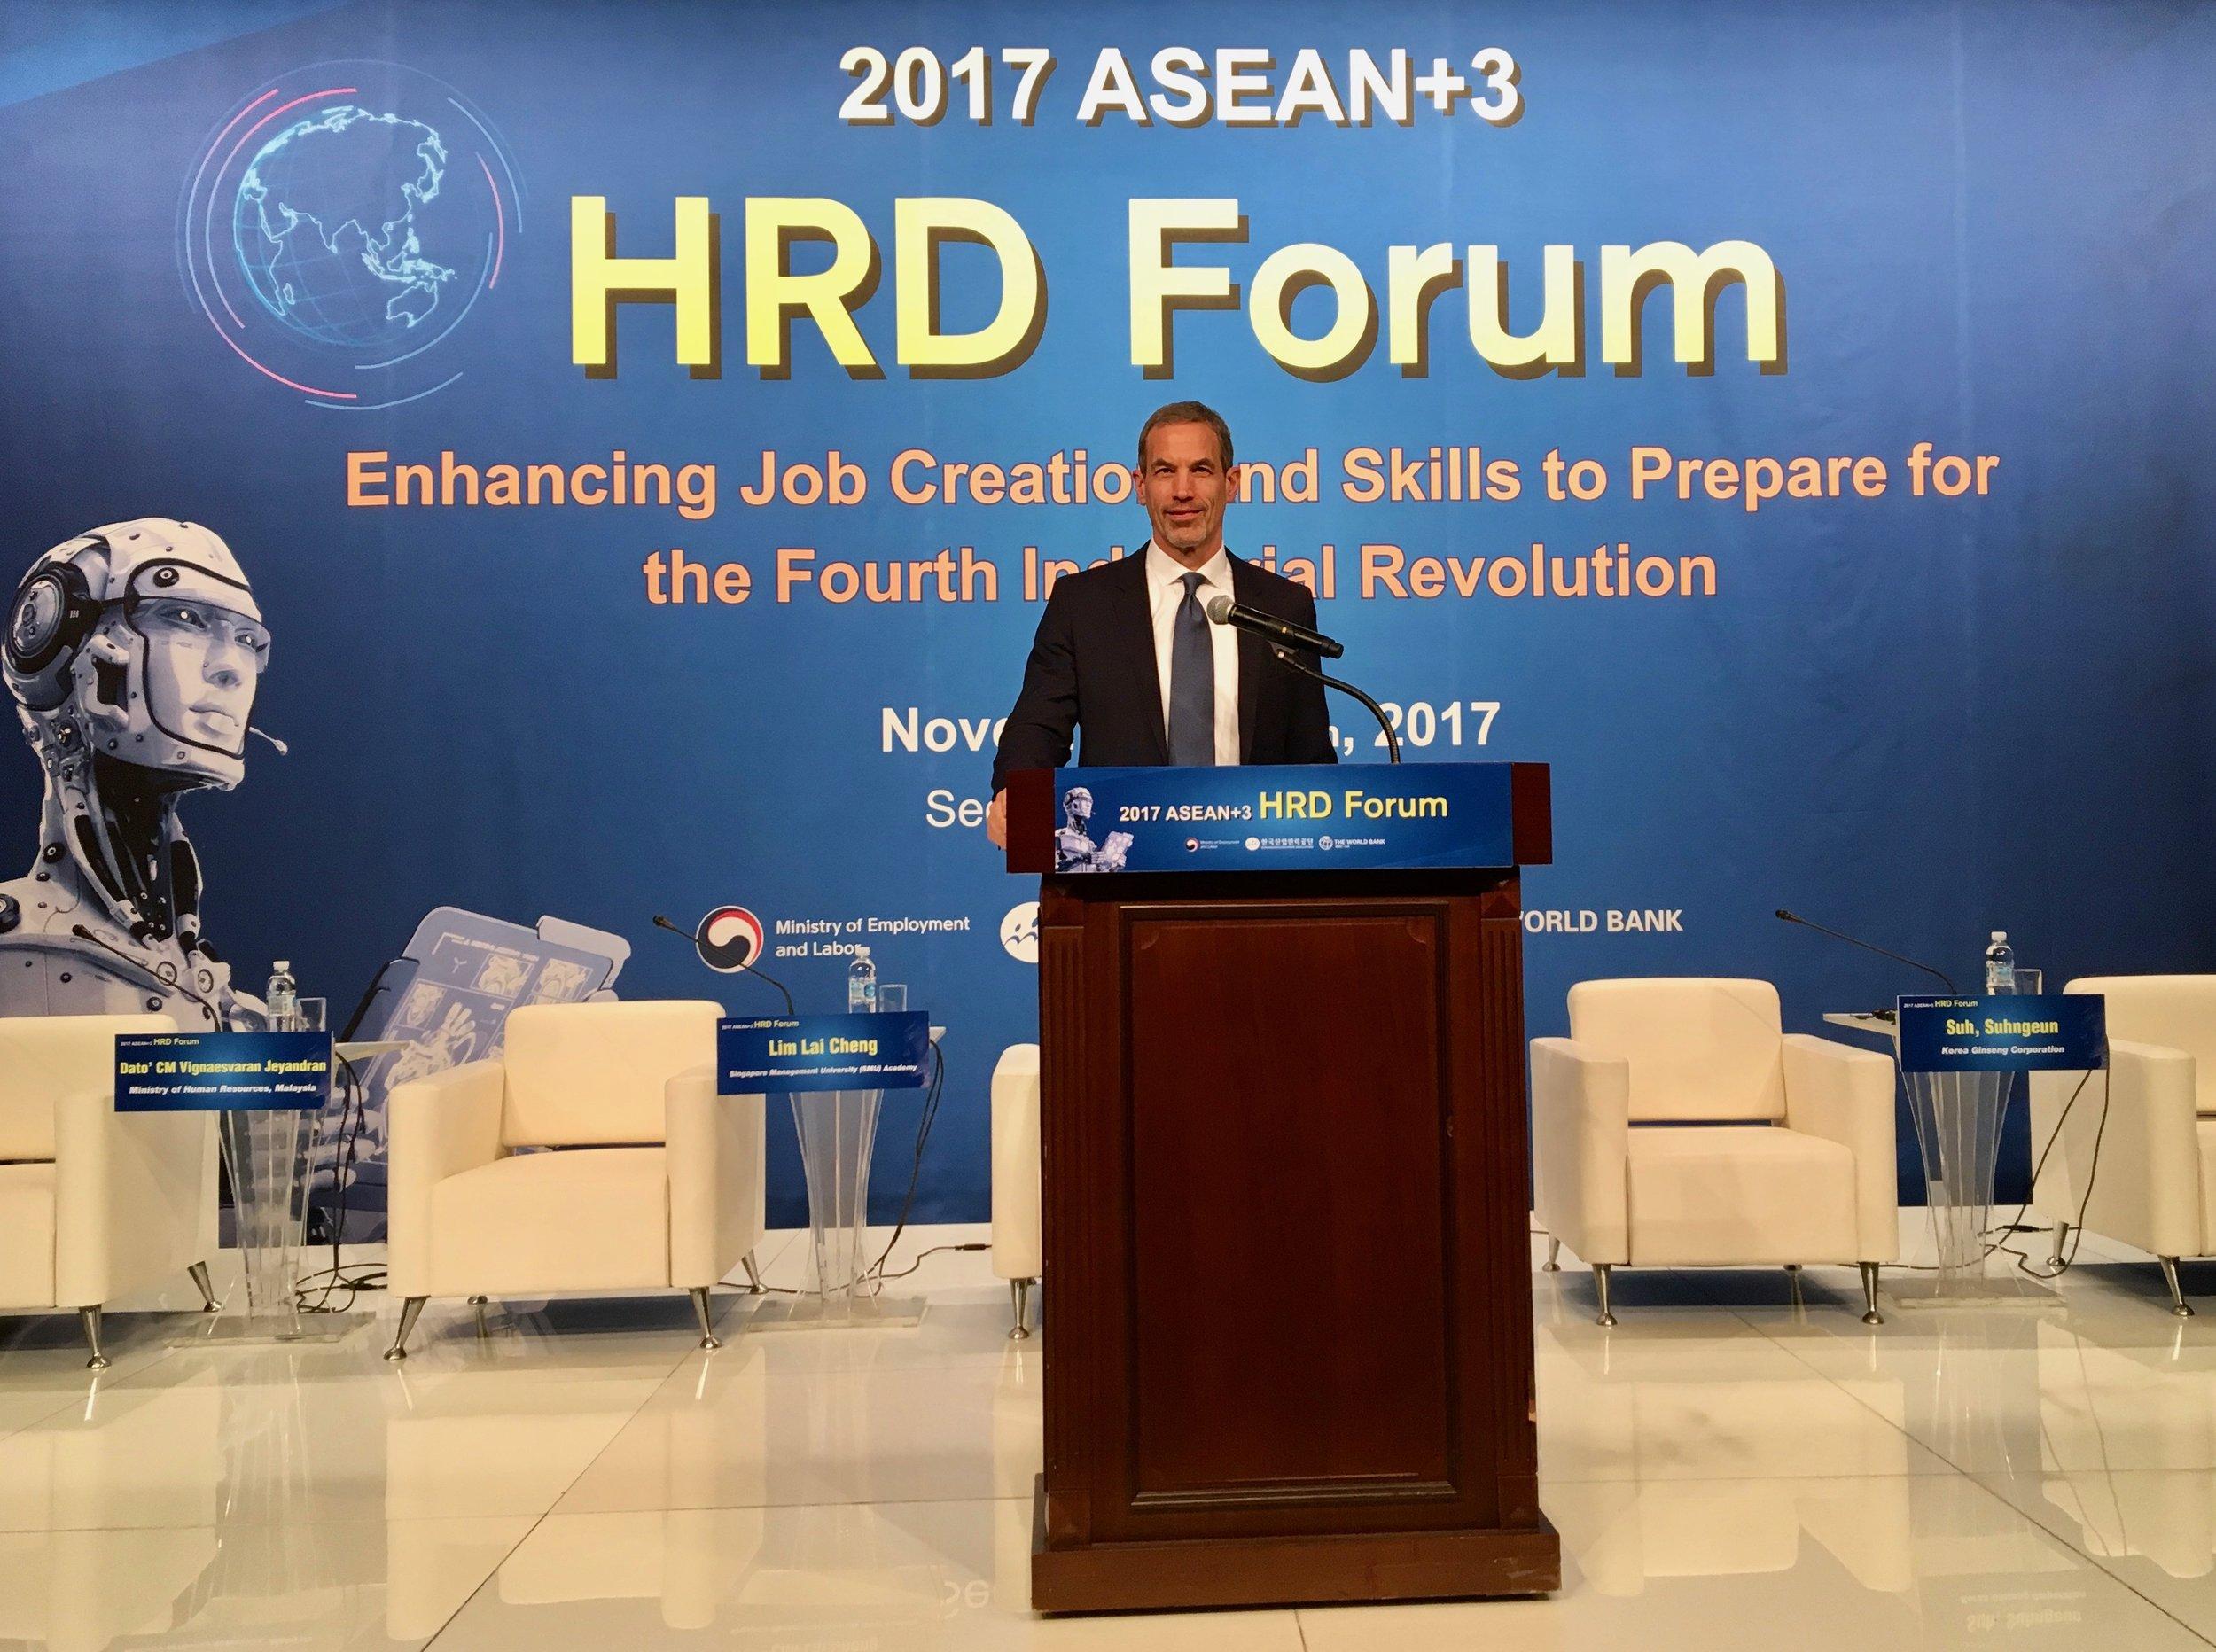 HRD Forum Seoul, South Korea *Photo credit HRD Korea